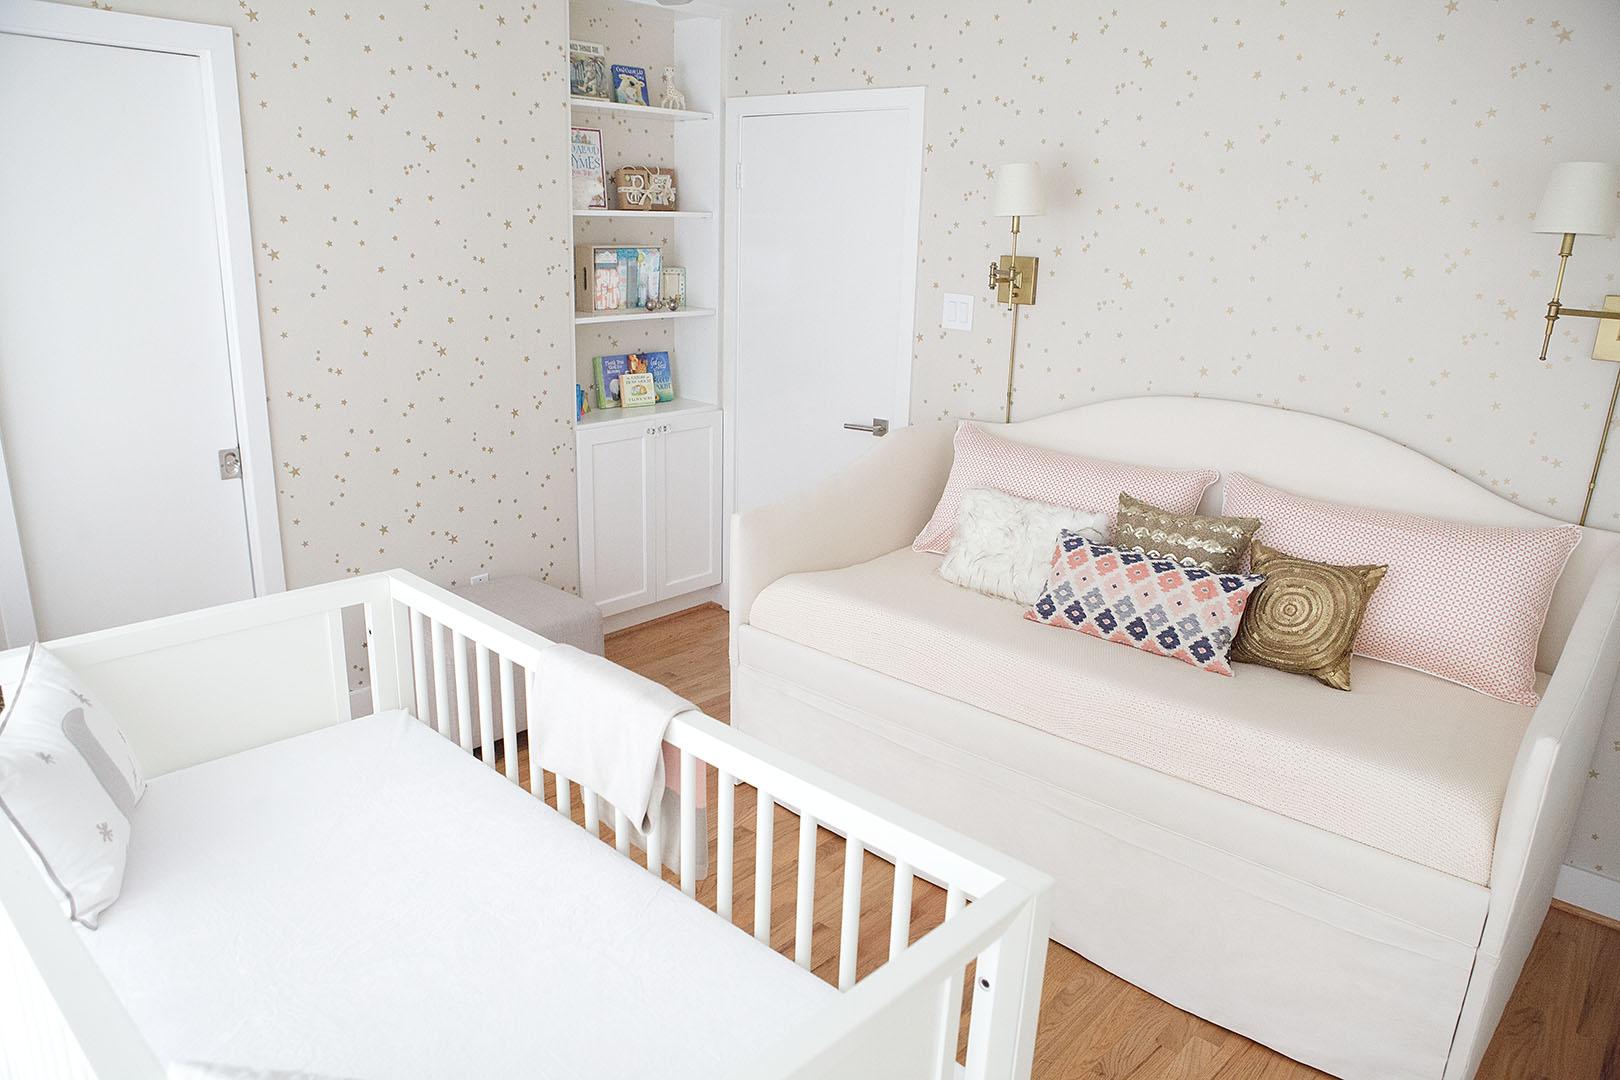 Kids room interior decor Oakland, CA